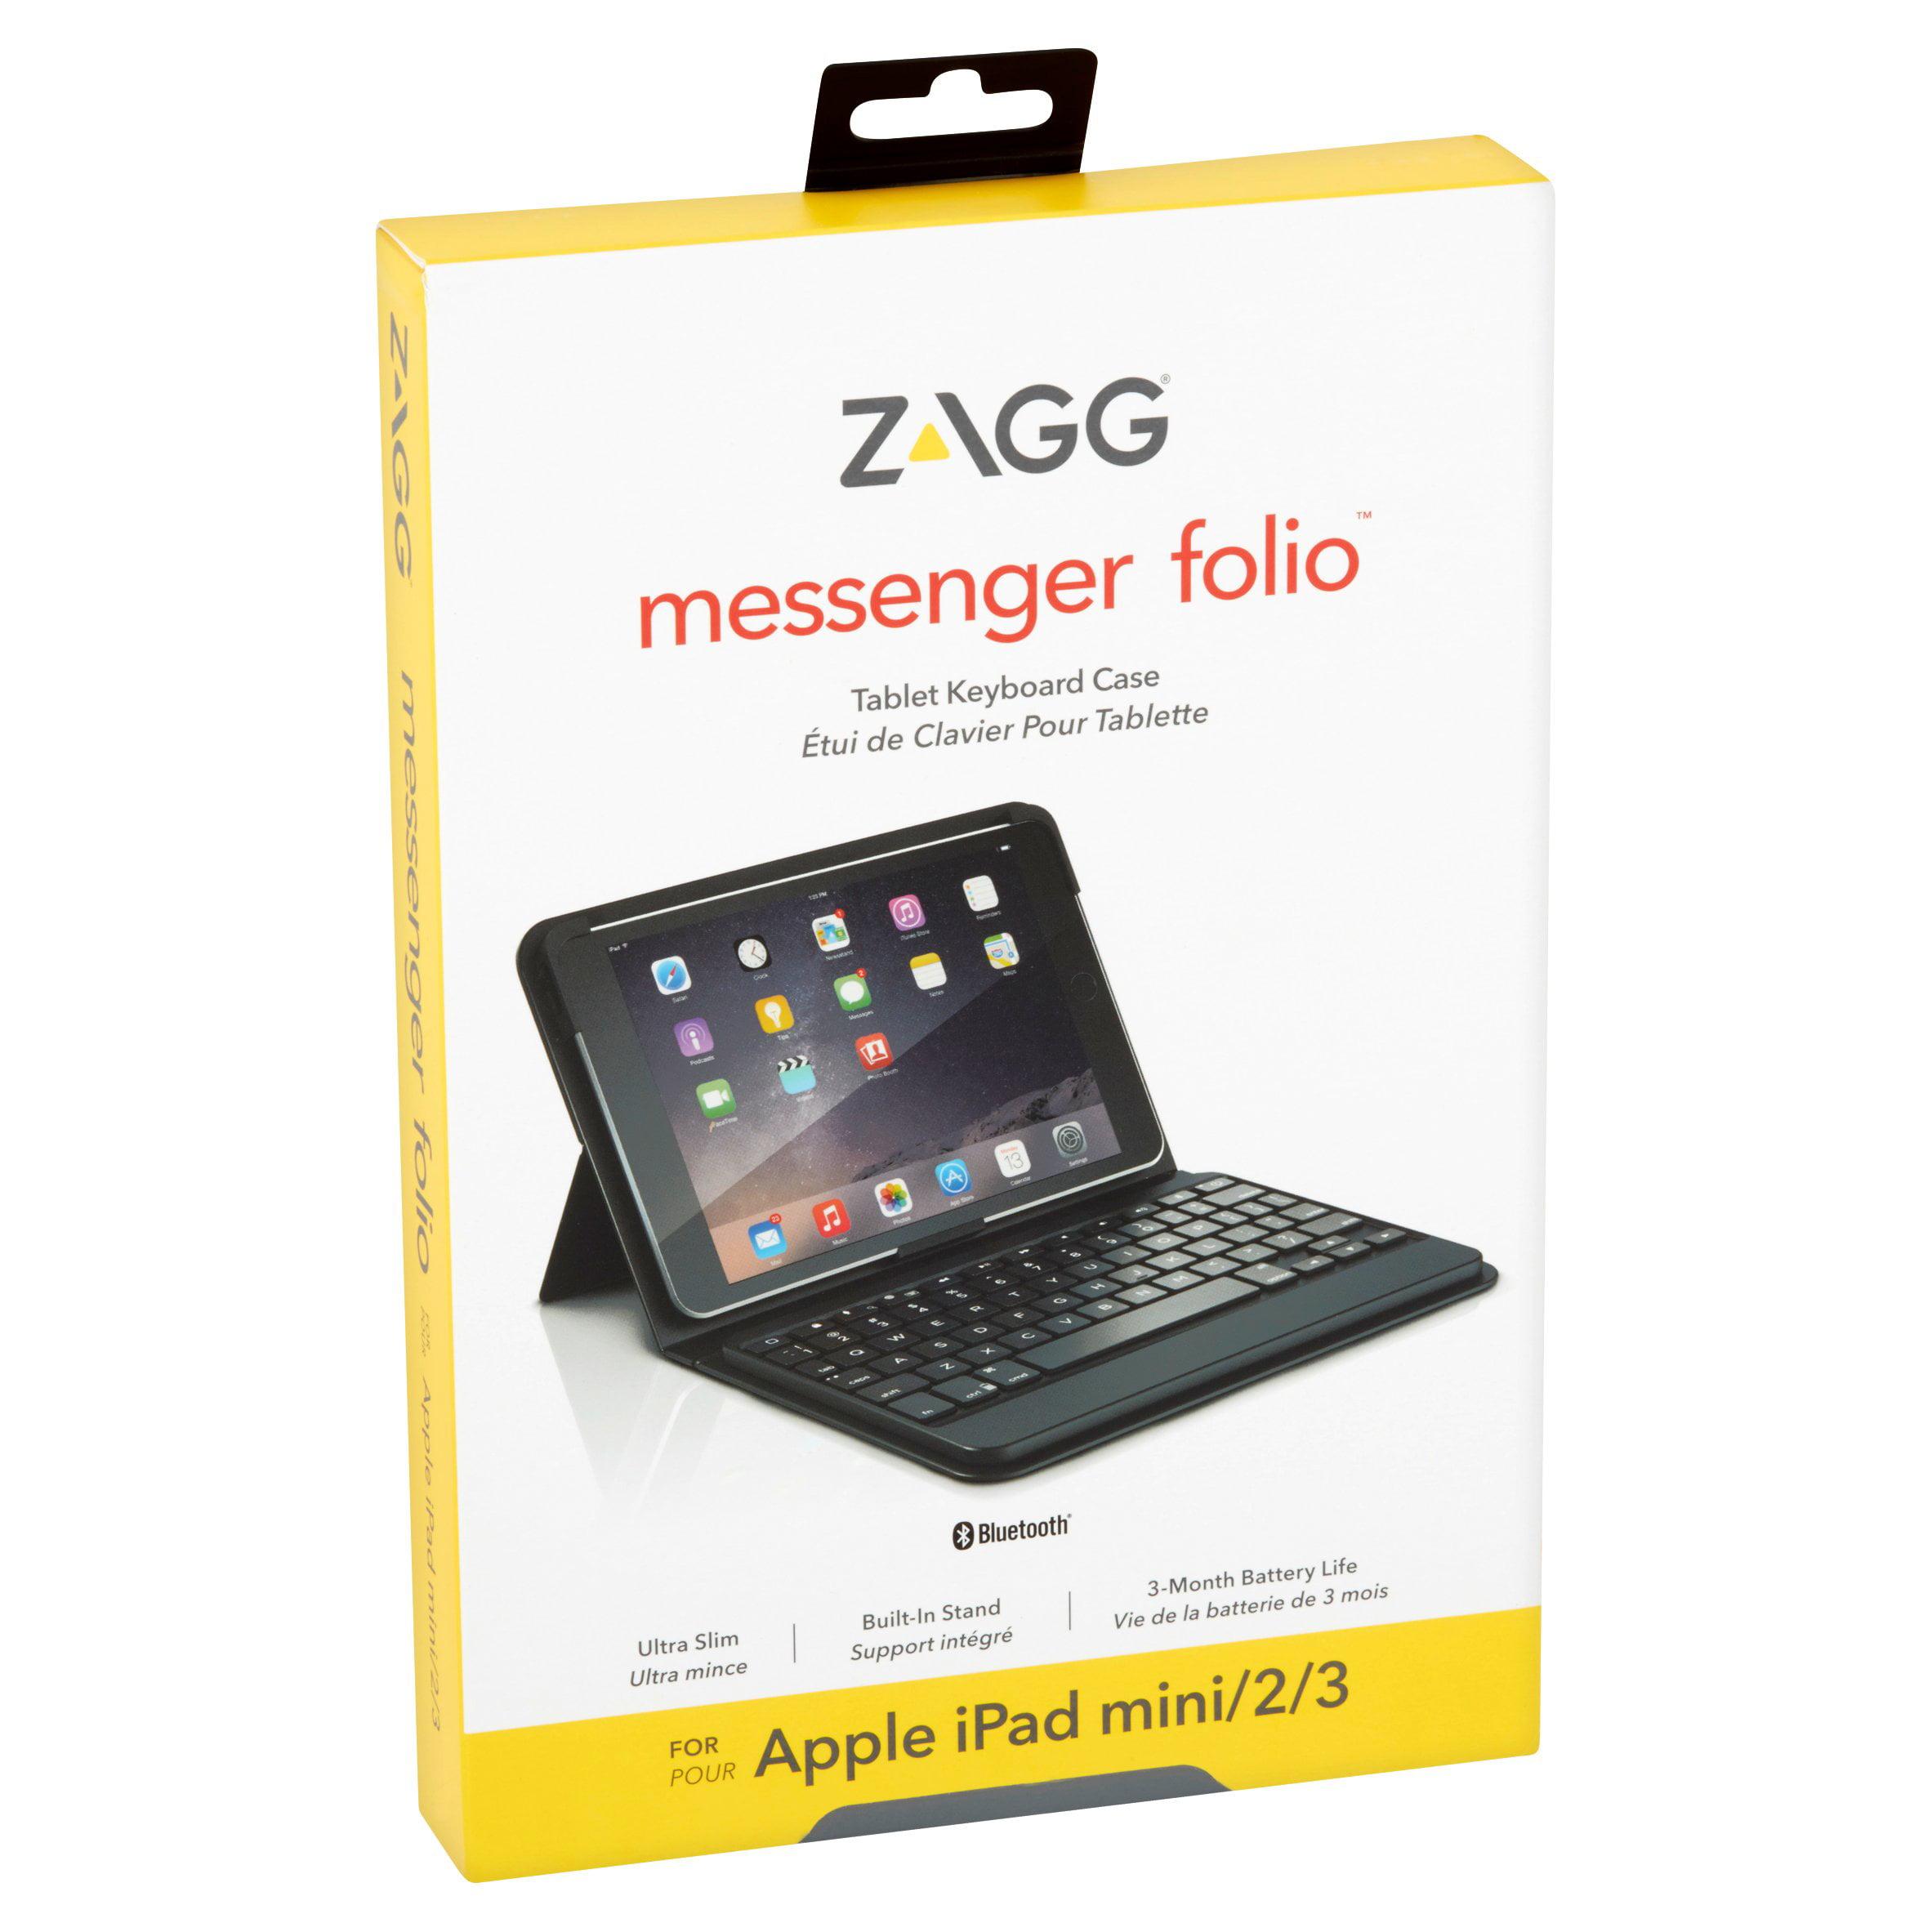 fdc99ecd2fc ZAGG Messenger Folio Case Hinged with Bluetooth Keyboard for Apple iPad  mini / iPad mini Retina / iPad mini 2/ iPad mini 3 - Black - Walmart.com